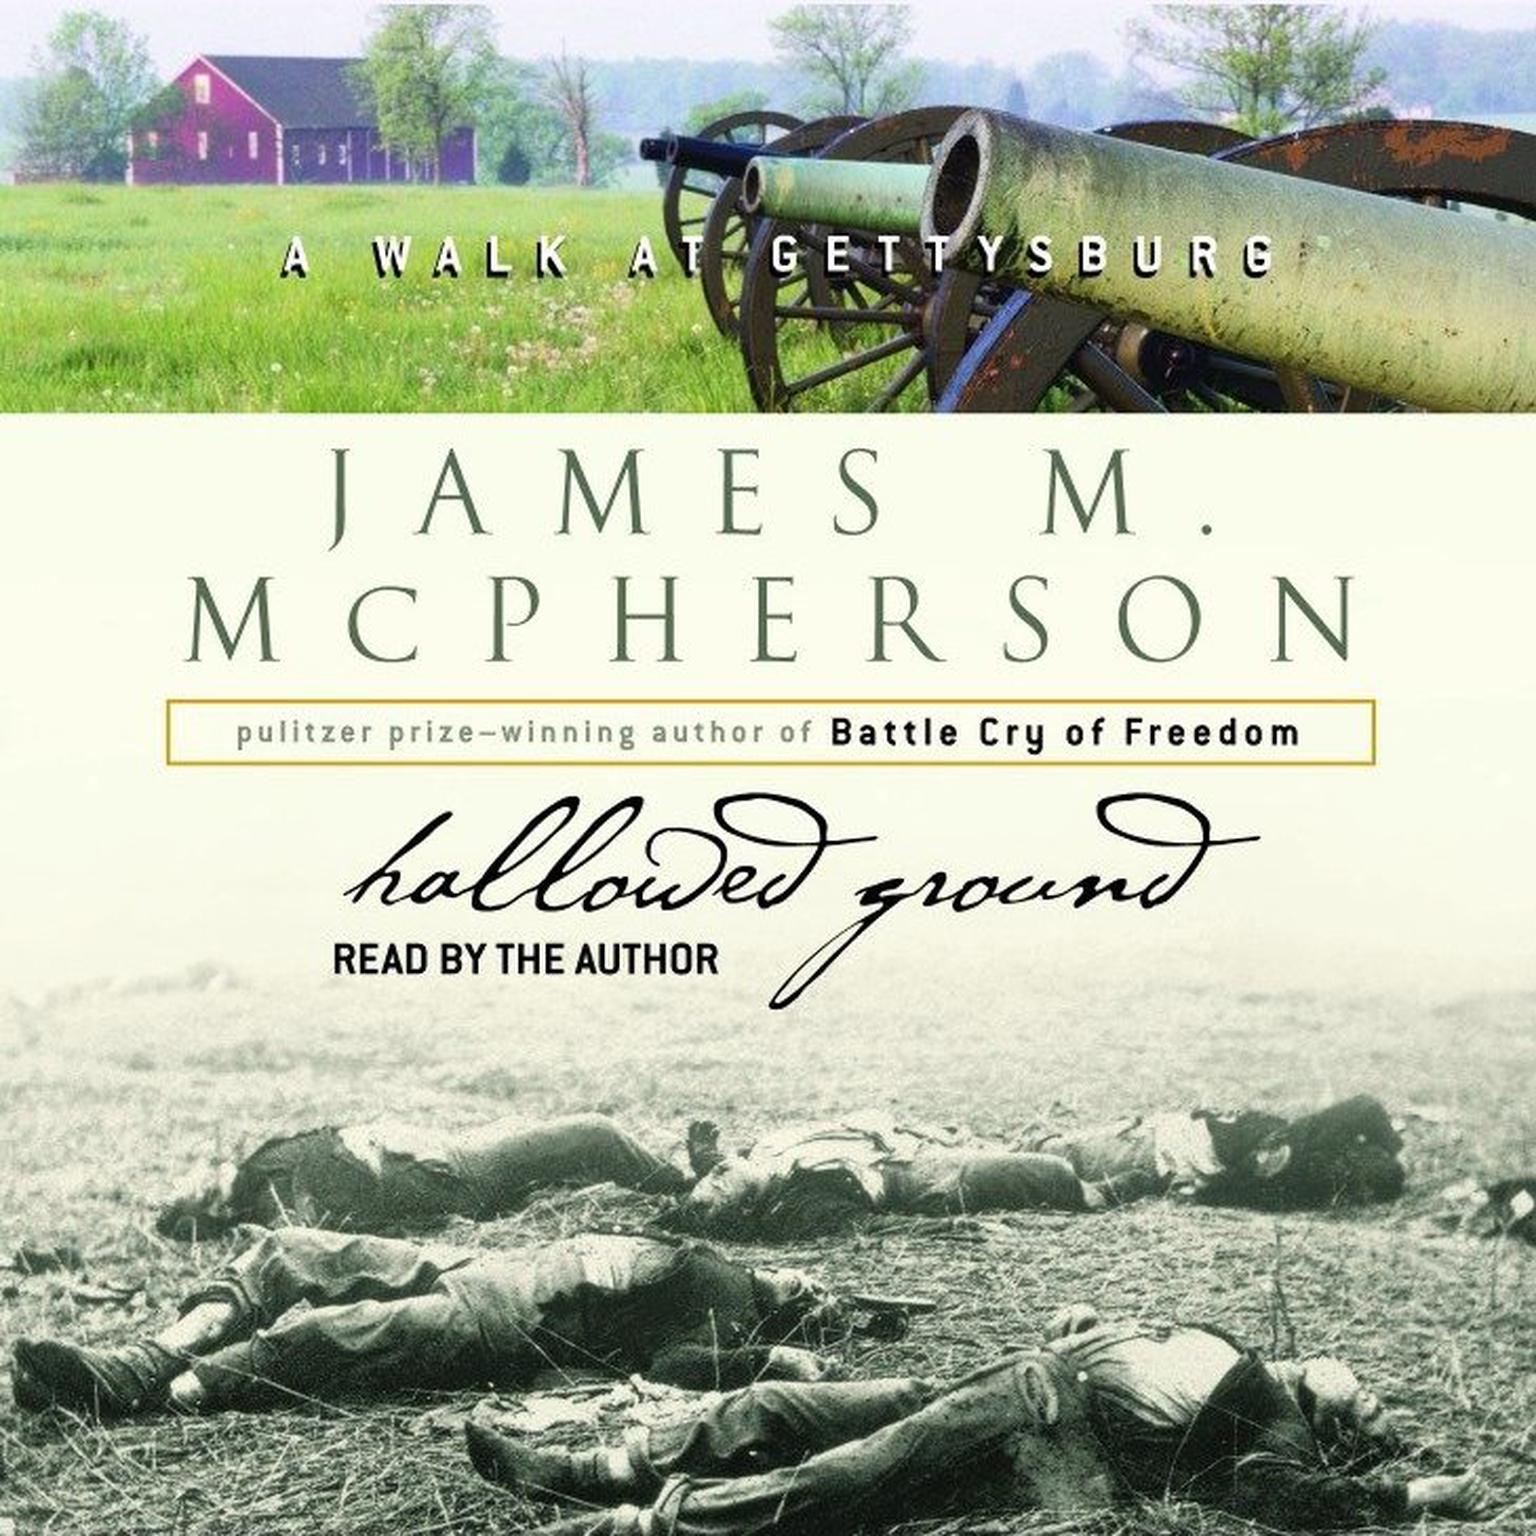 Printable Hallowed Ground: A Walk at Gettysburg Audiobook Cover Art